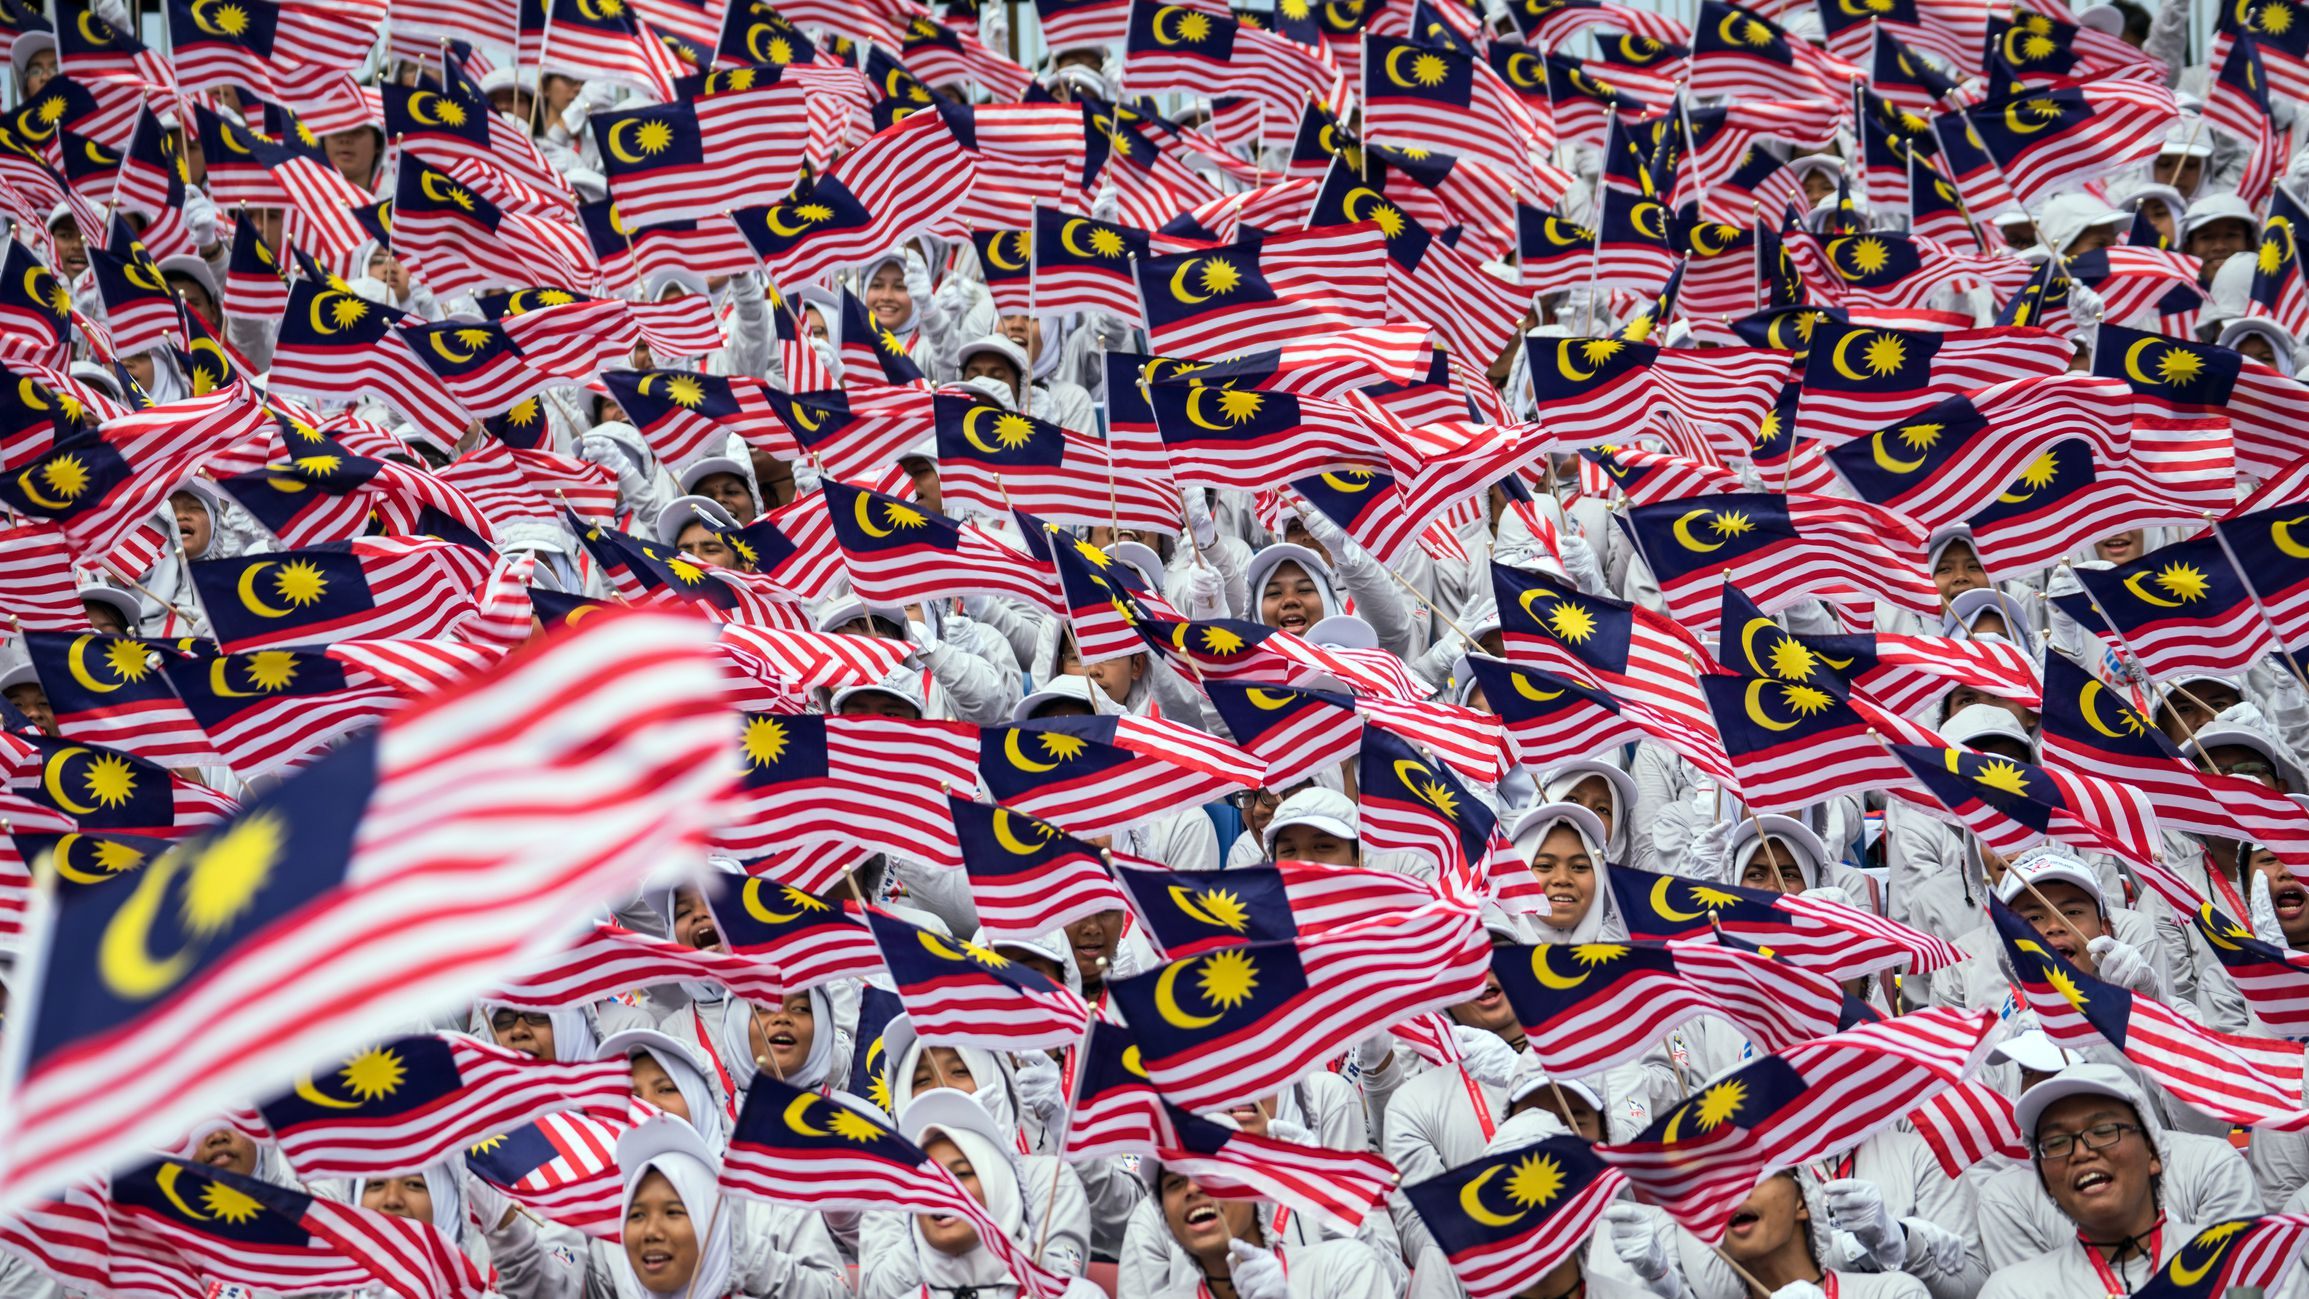 People waving Malaysian flags during Merdeka parade